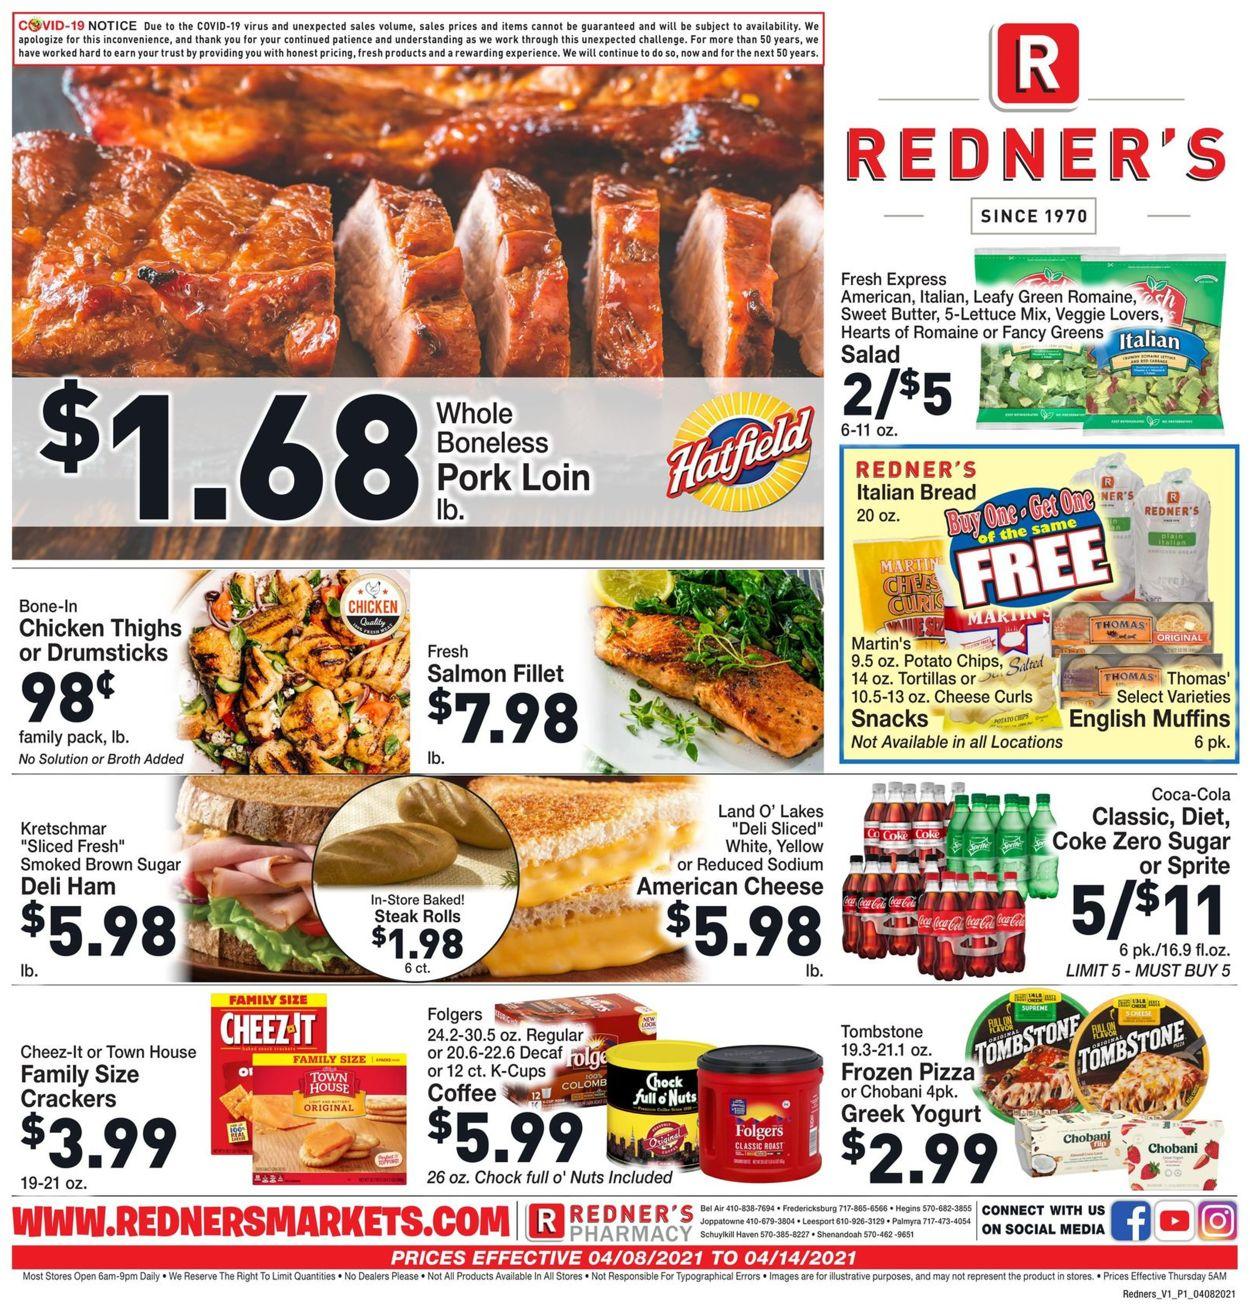 Redner's Warehouse Market Weekly Ad Circular - valid 04/08-04/14/2021